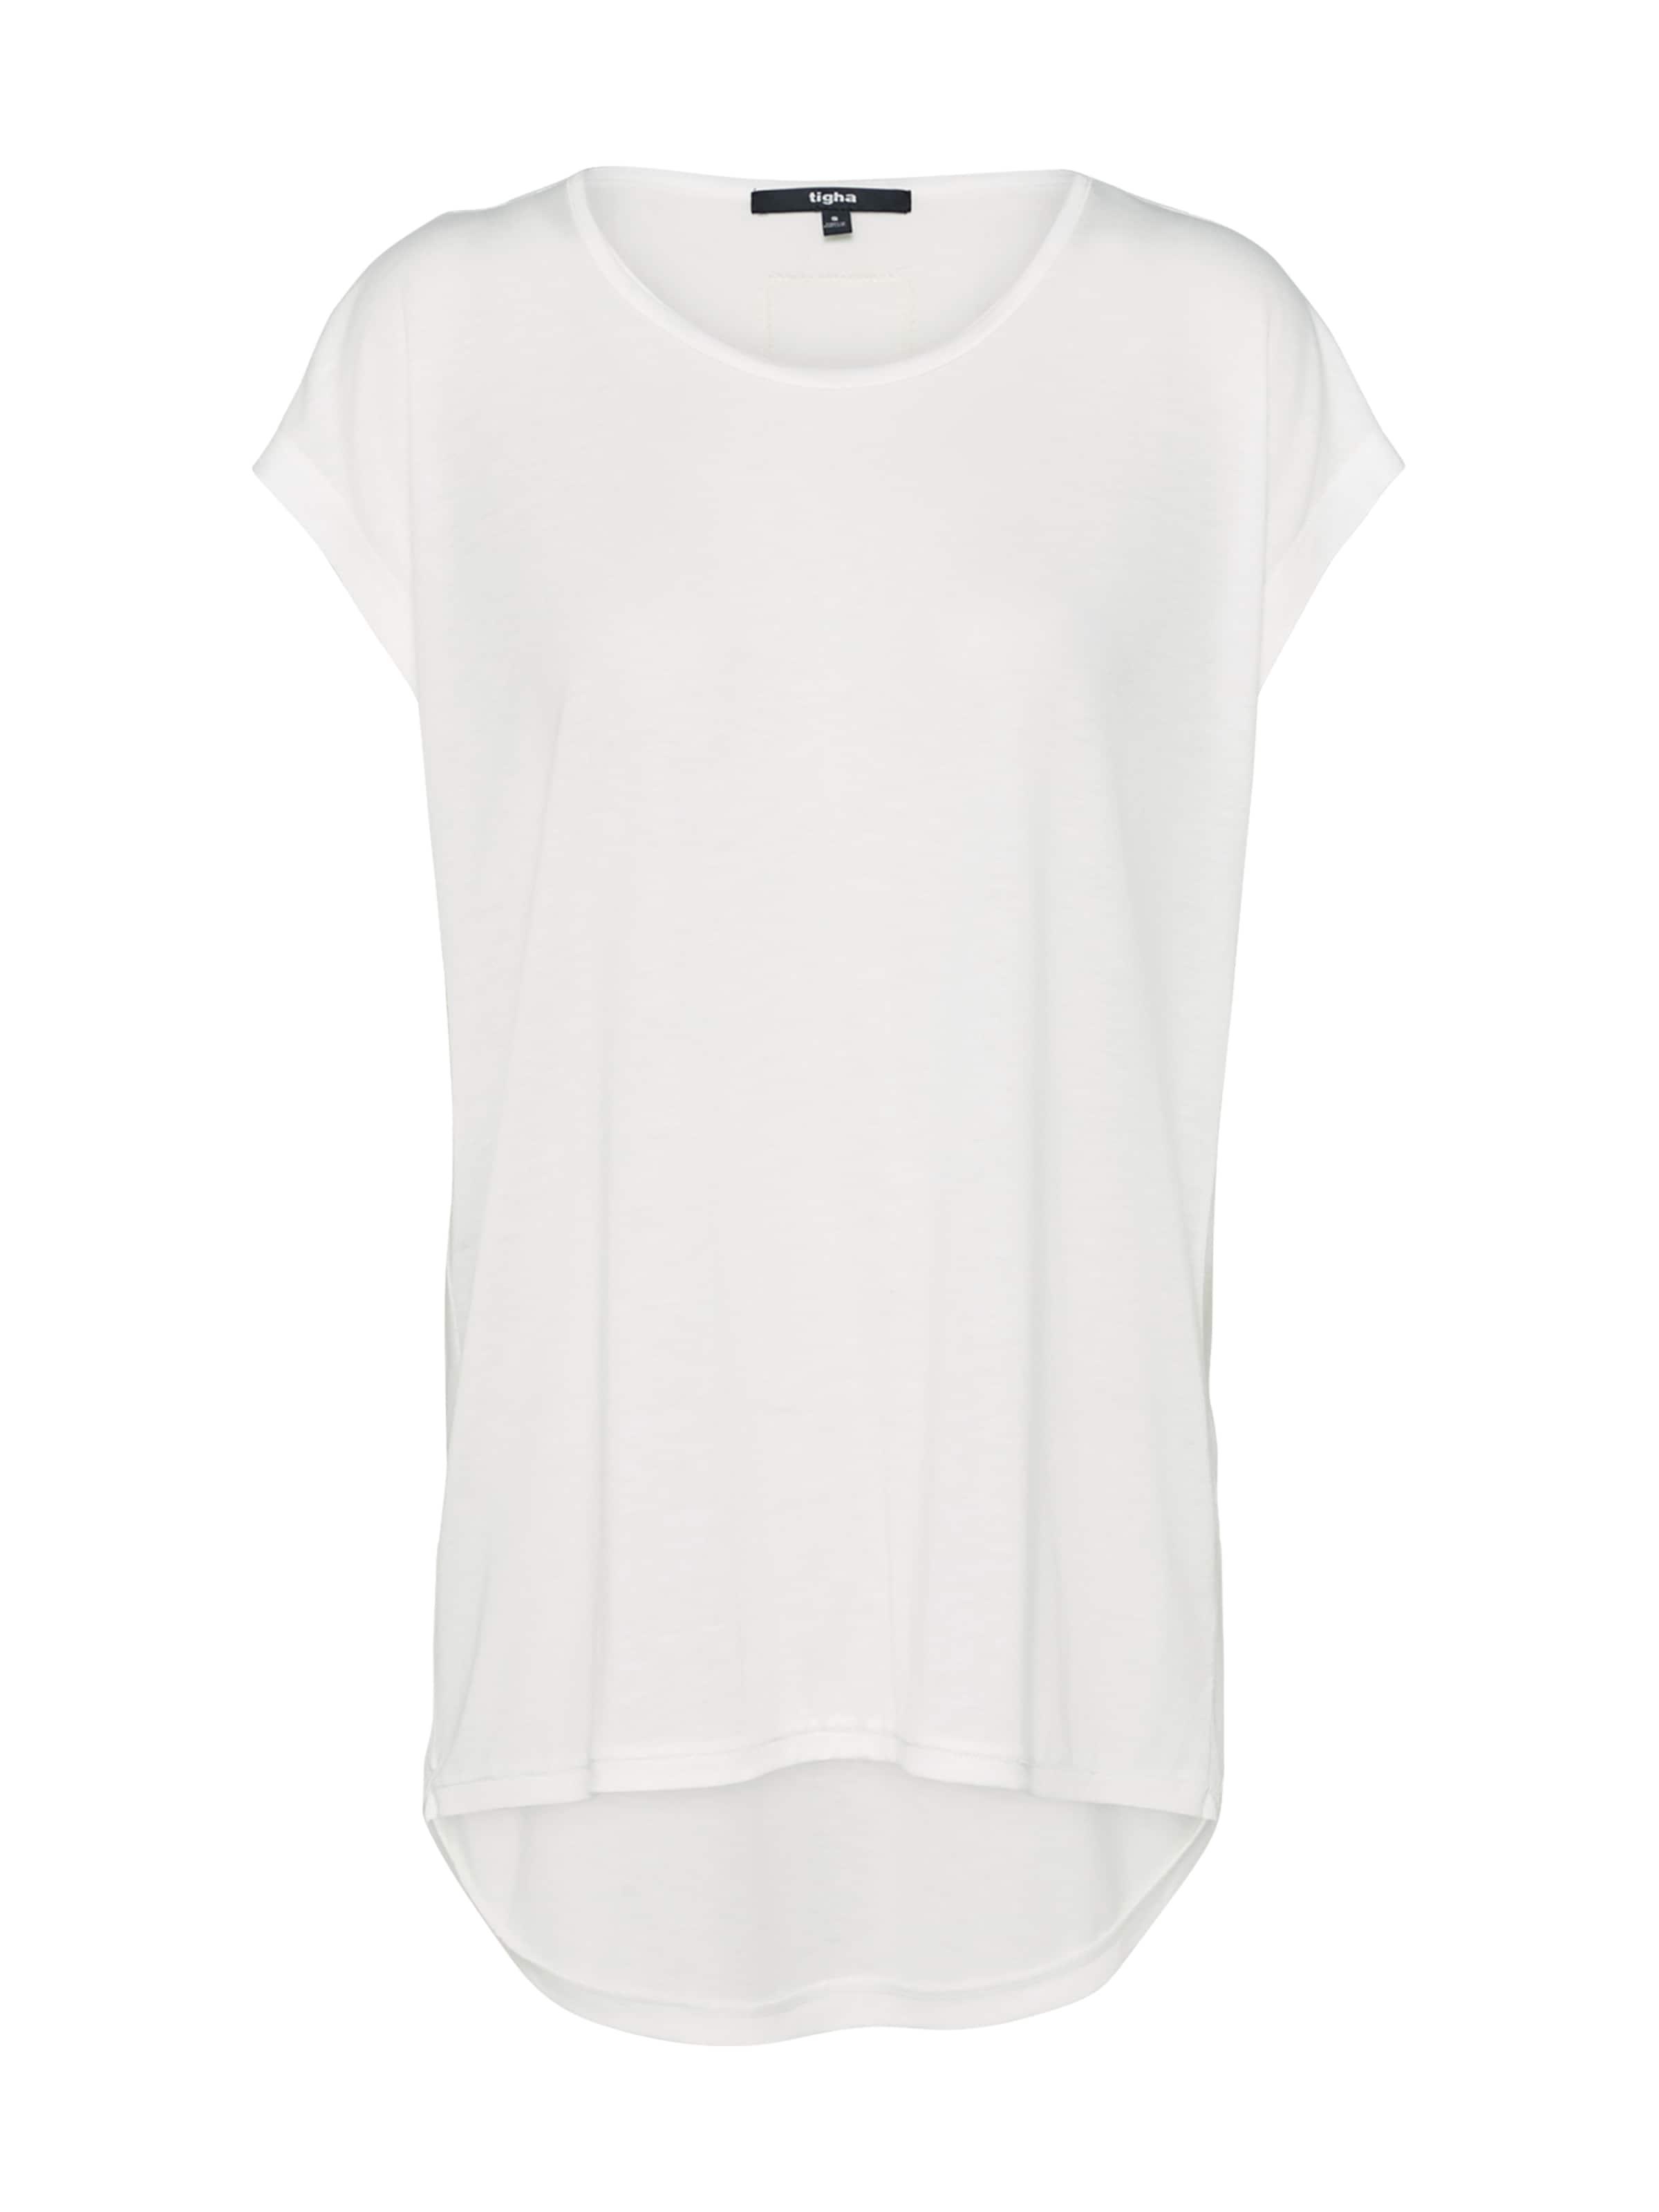 'effi' Shirt Offwhite In Tigha pUzqVSM